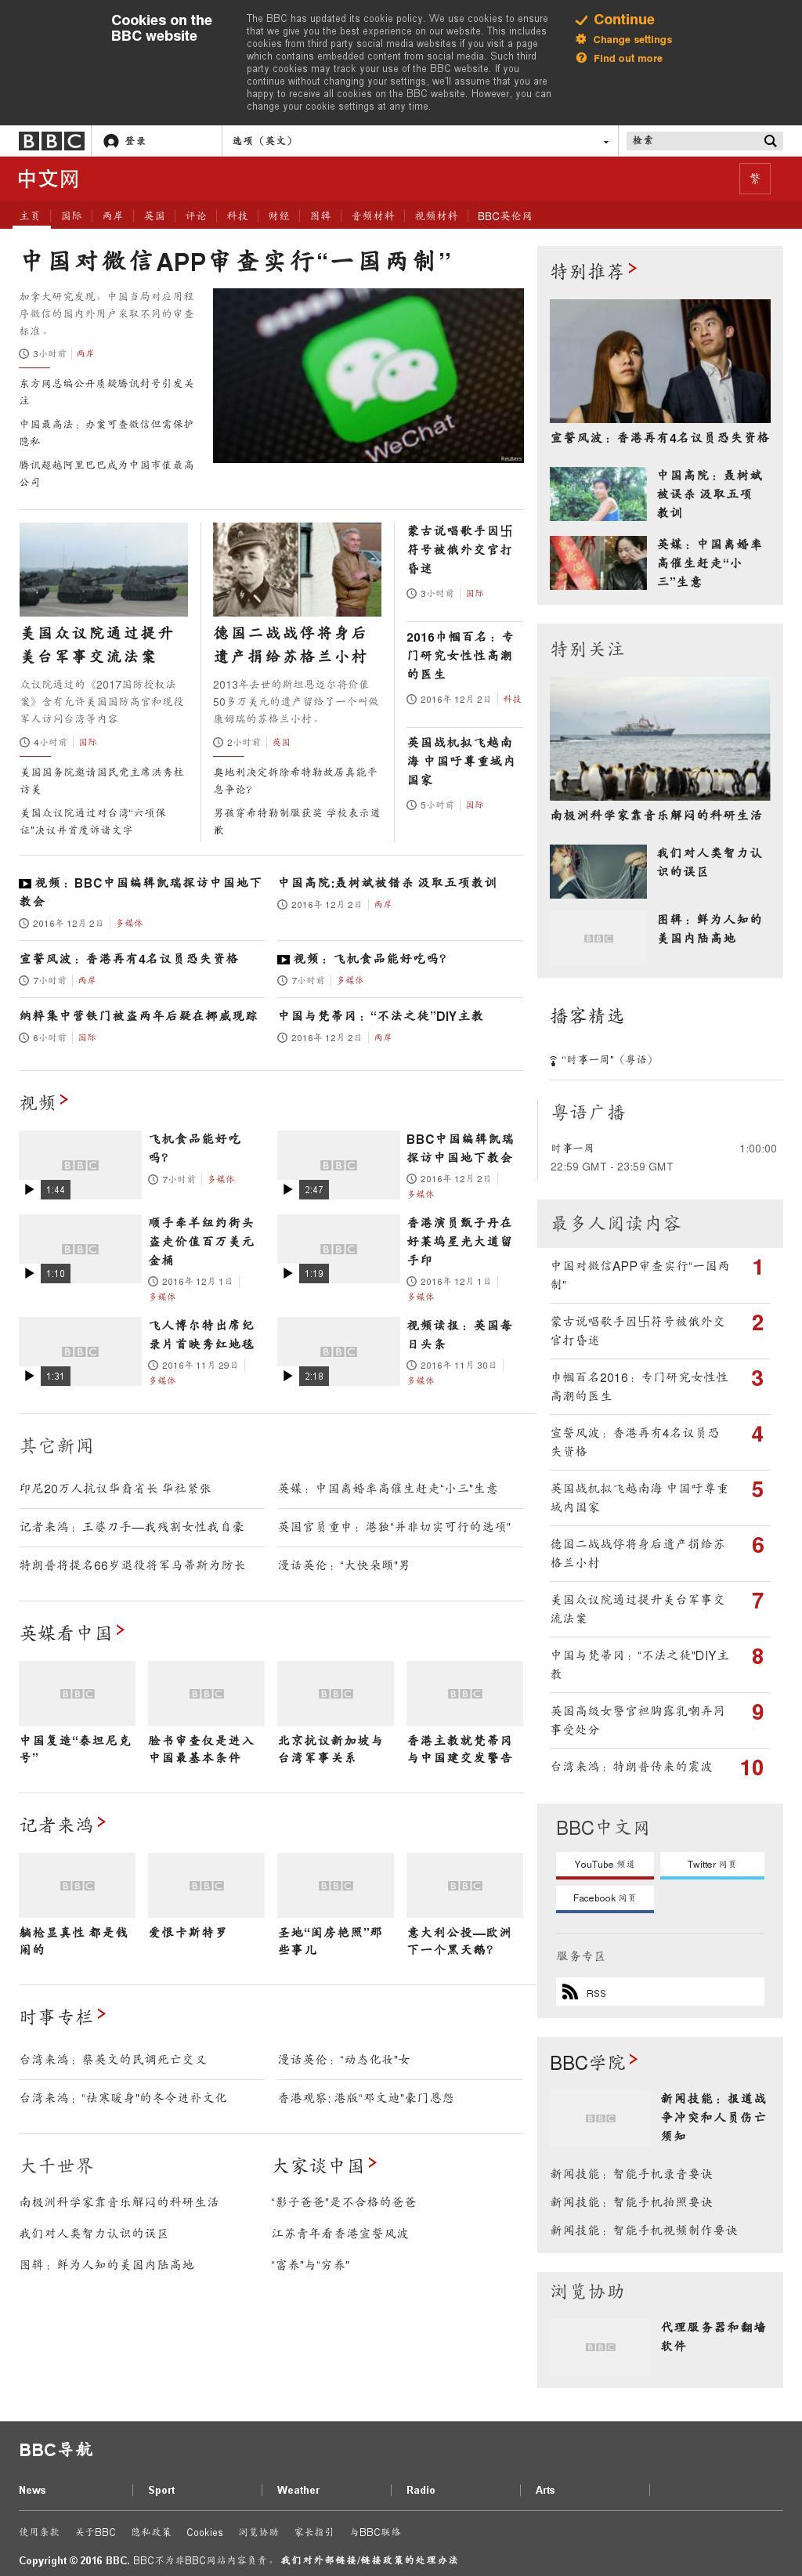 BBC (Chinese) at Saturday Dec. 3, 2016, 1:01 a.m. UTC